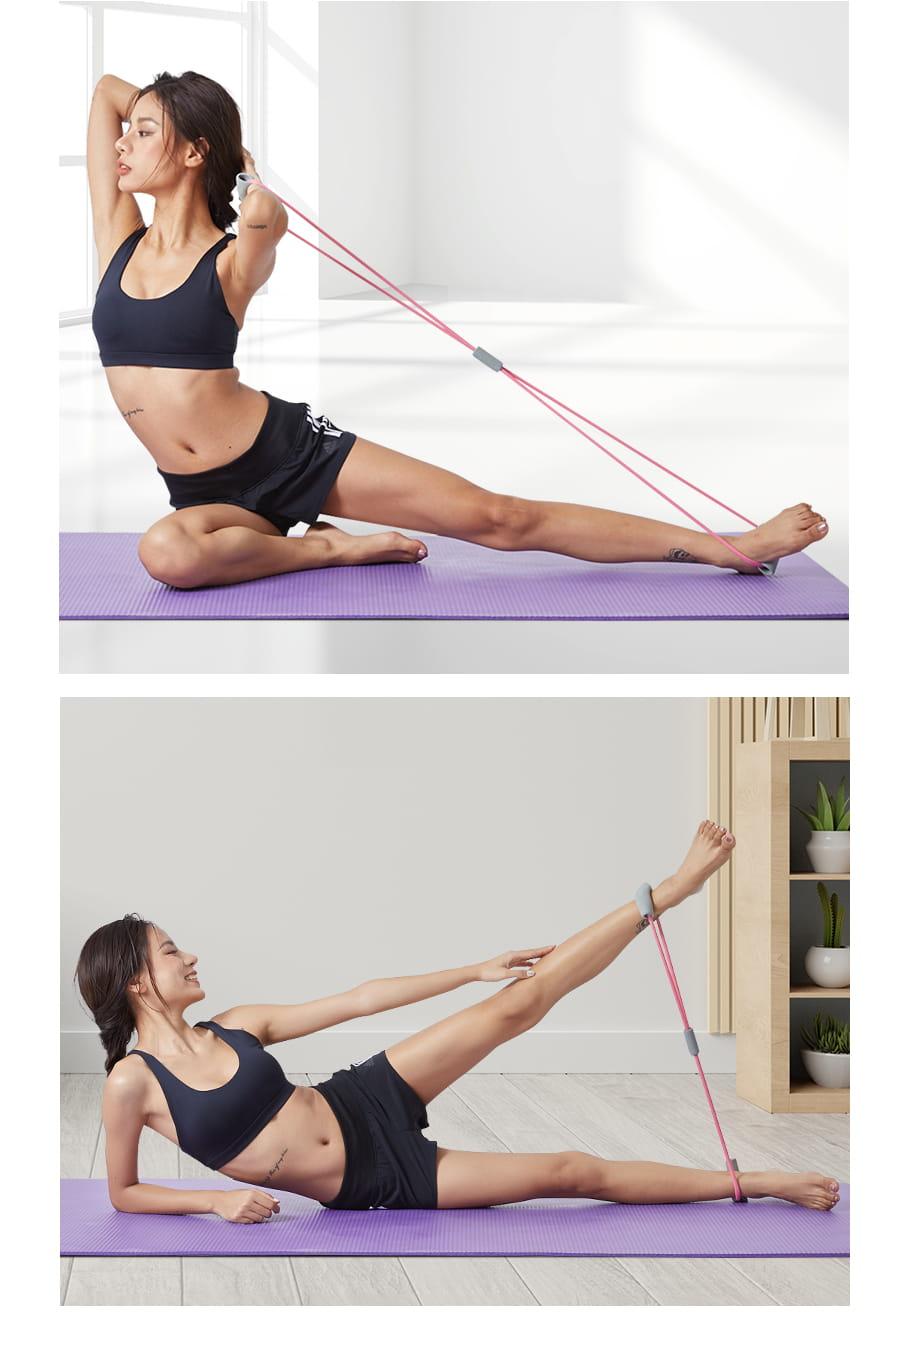 【Un-Sport高機能】Fitness Kit女力健身超值套組(8字拉力帶+瑜珈環) 4